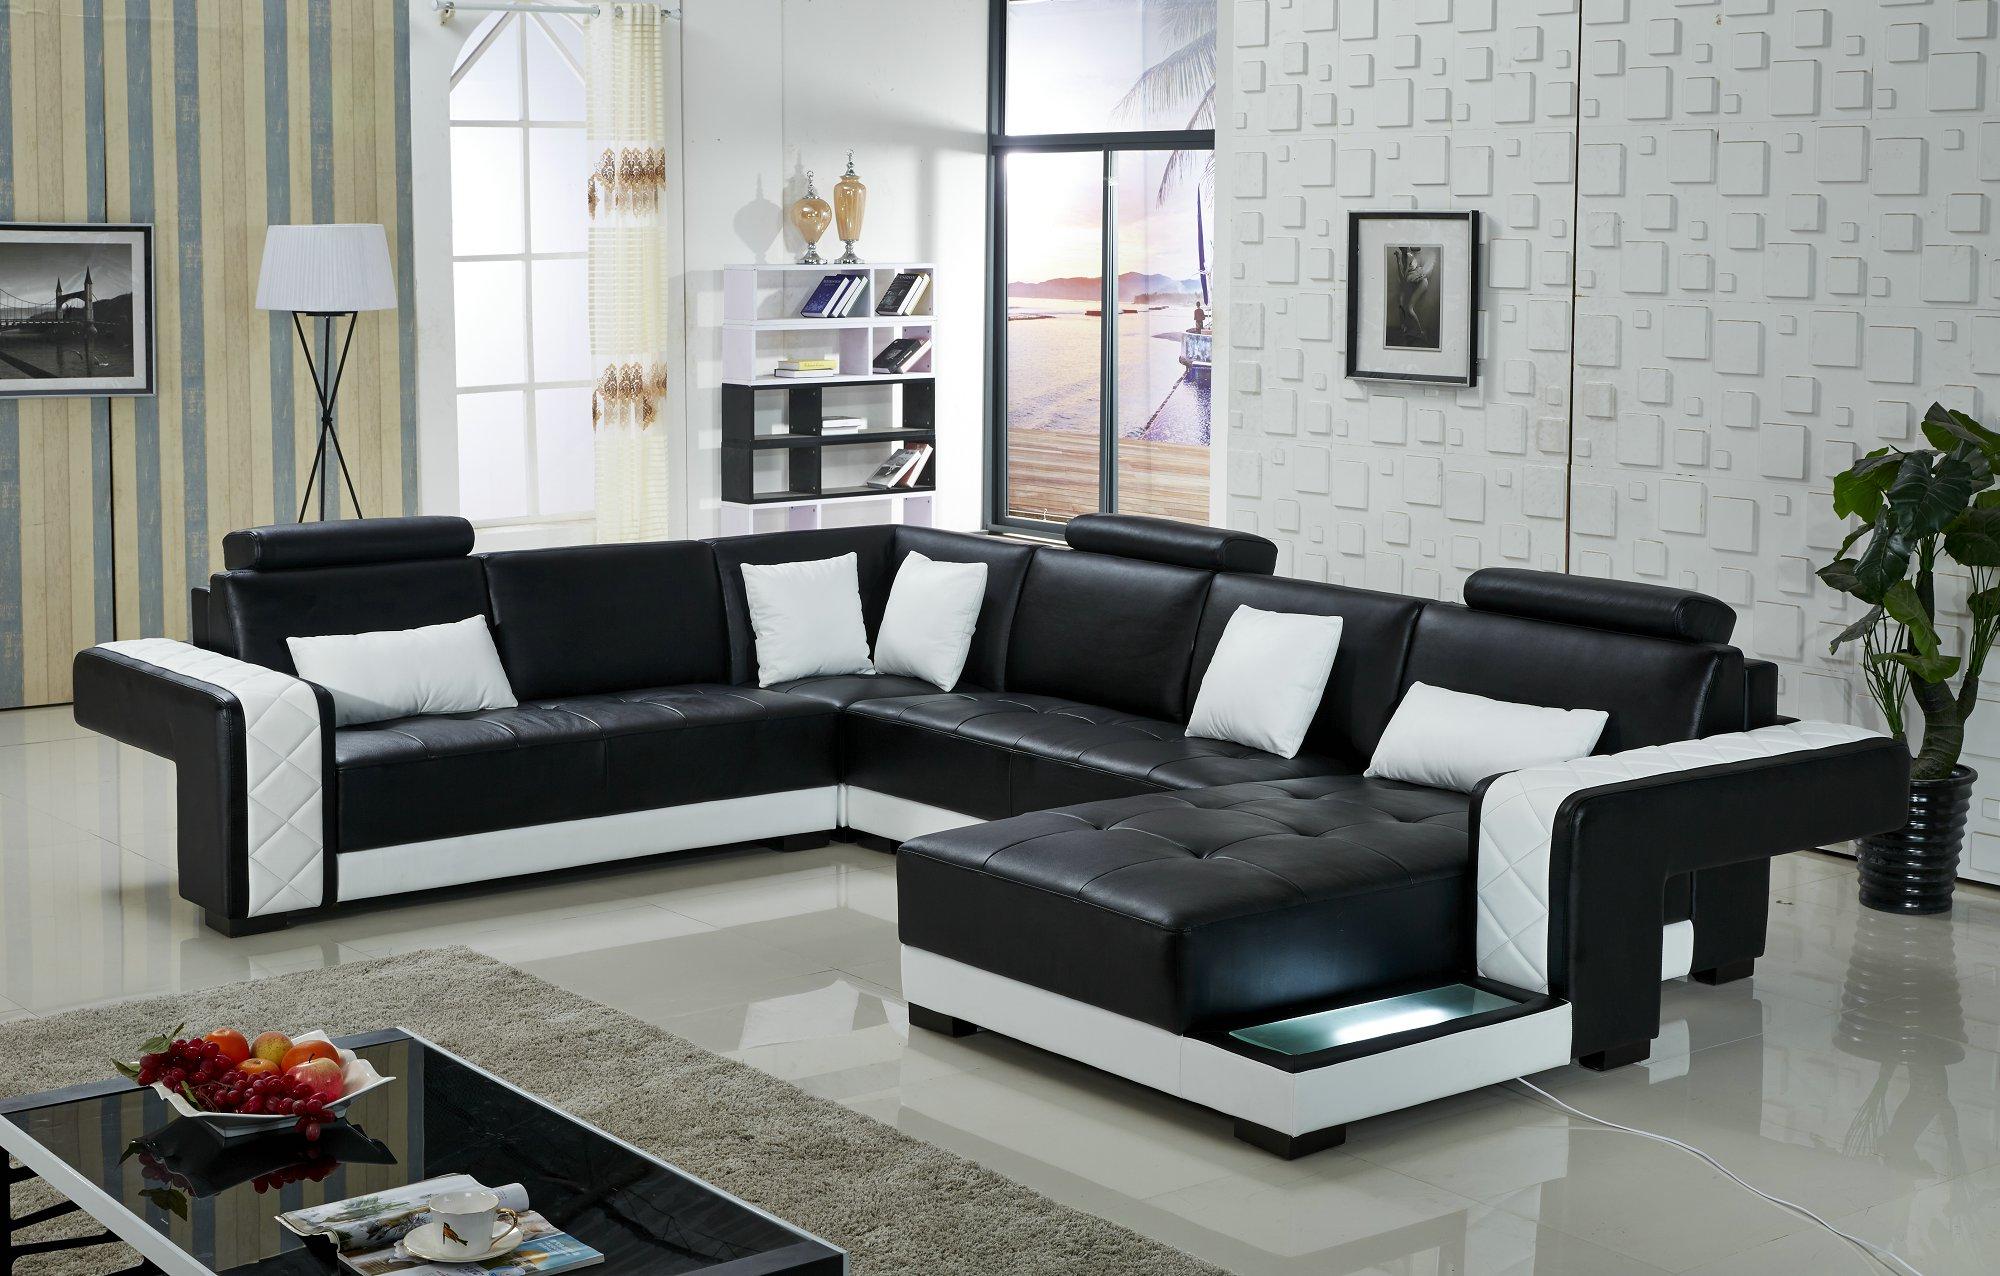 Living Room Furniture Dimensions Modern Living Room Furniture Leather Sofa H2211 Leather Sofa